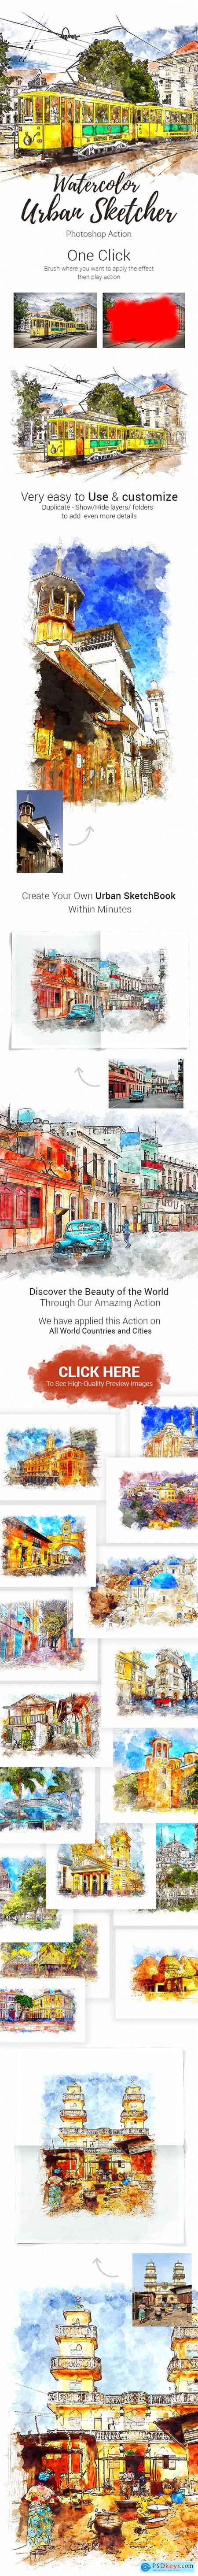 Graphicriver Realistic Urban Sketcher Photoshop Action 23175837